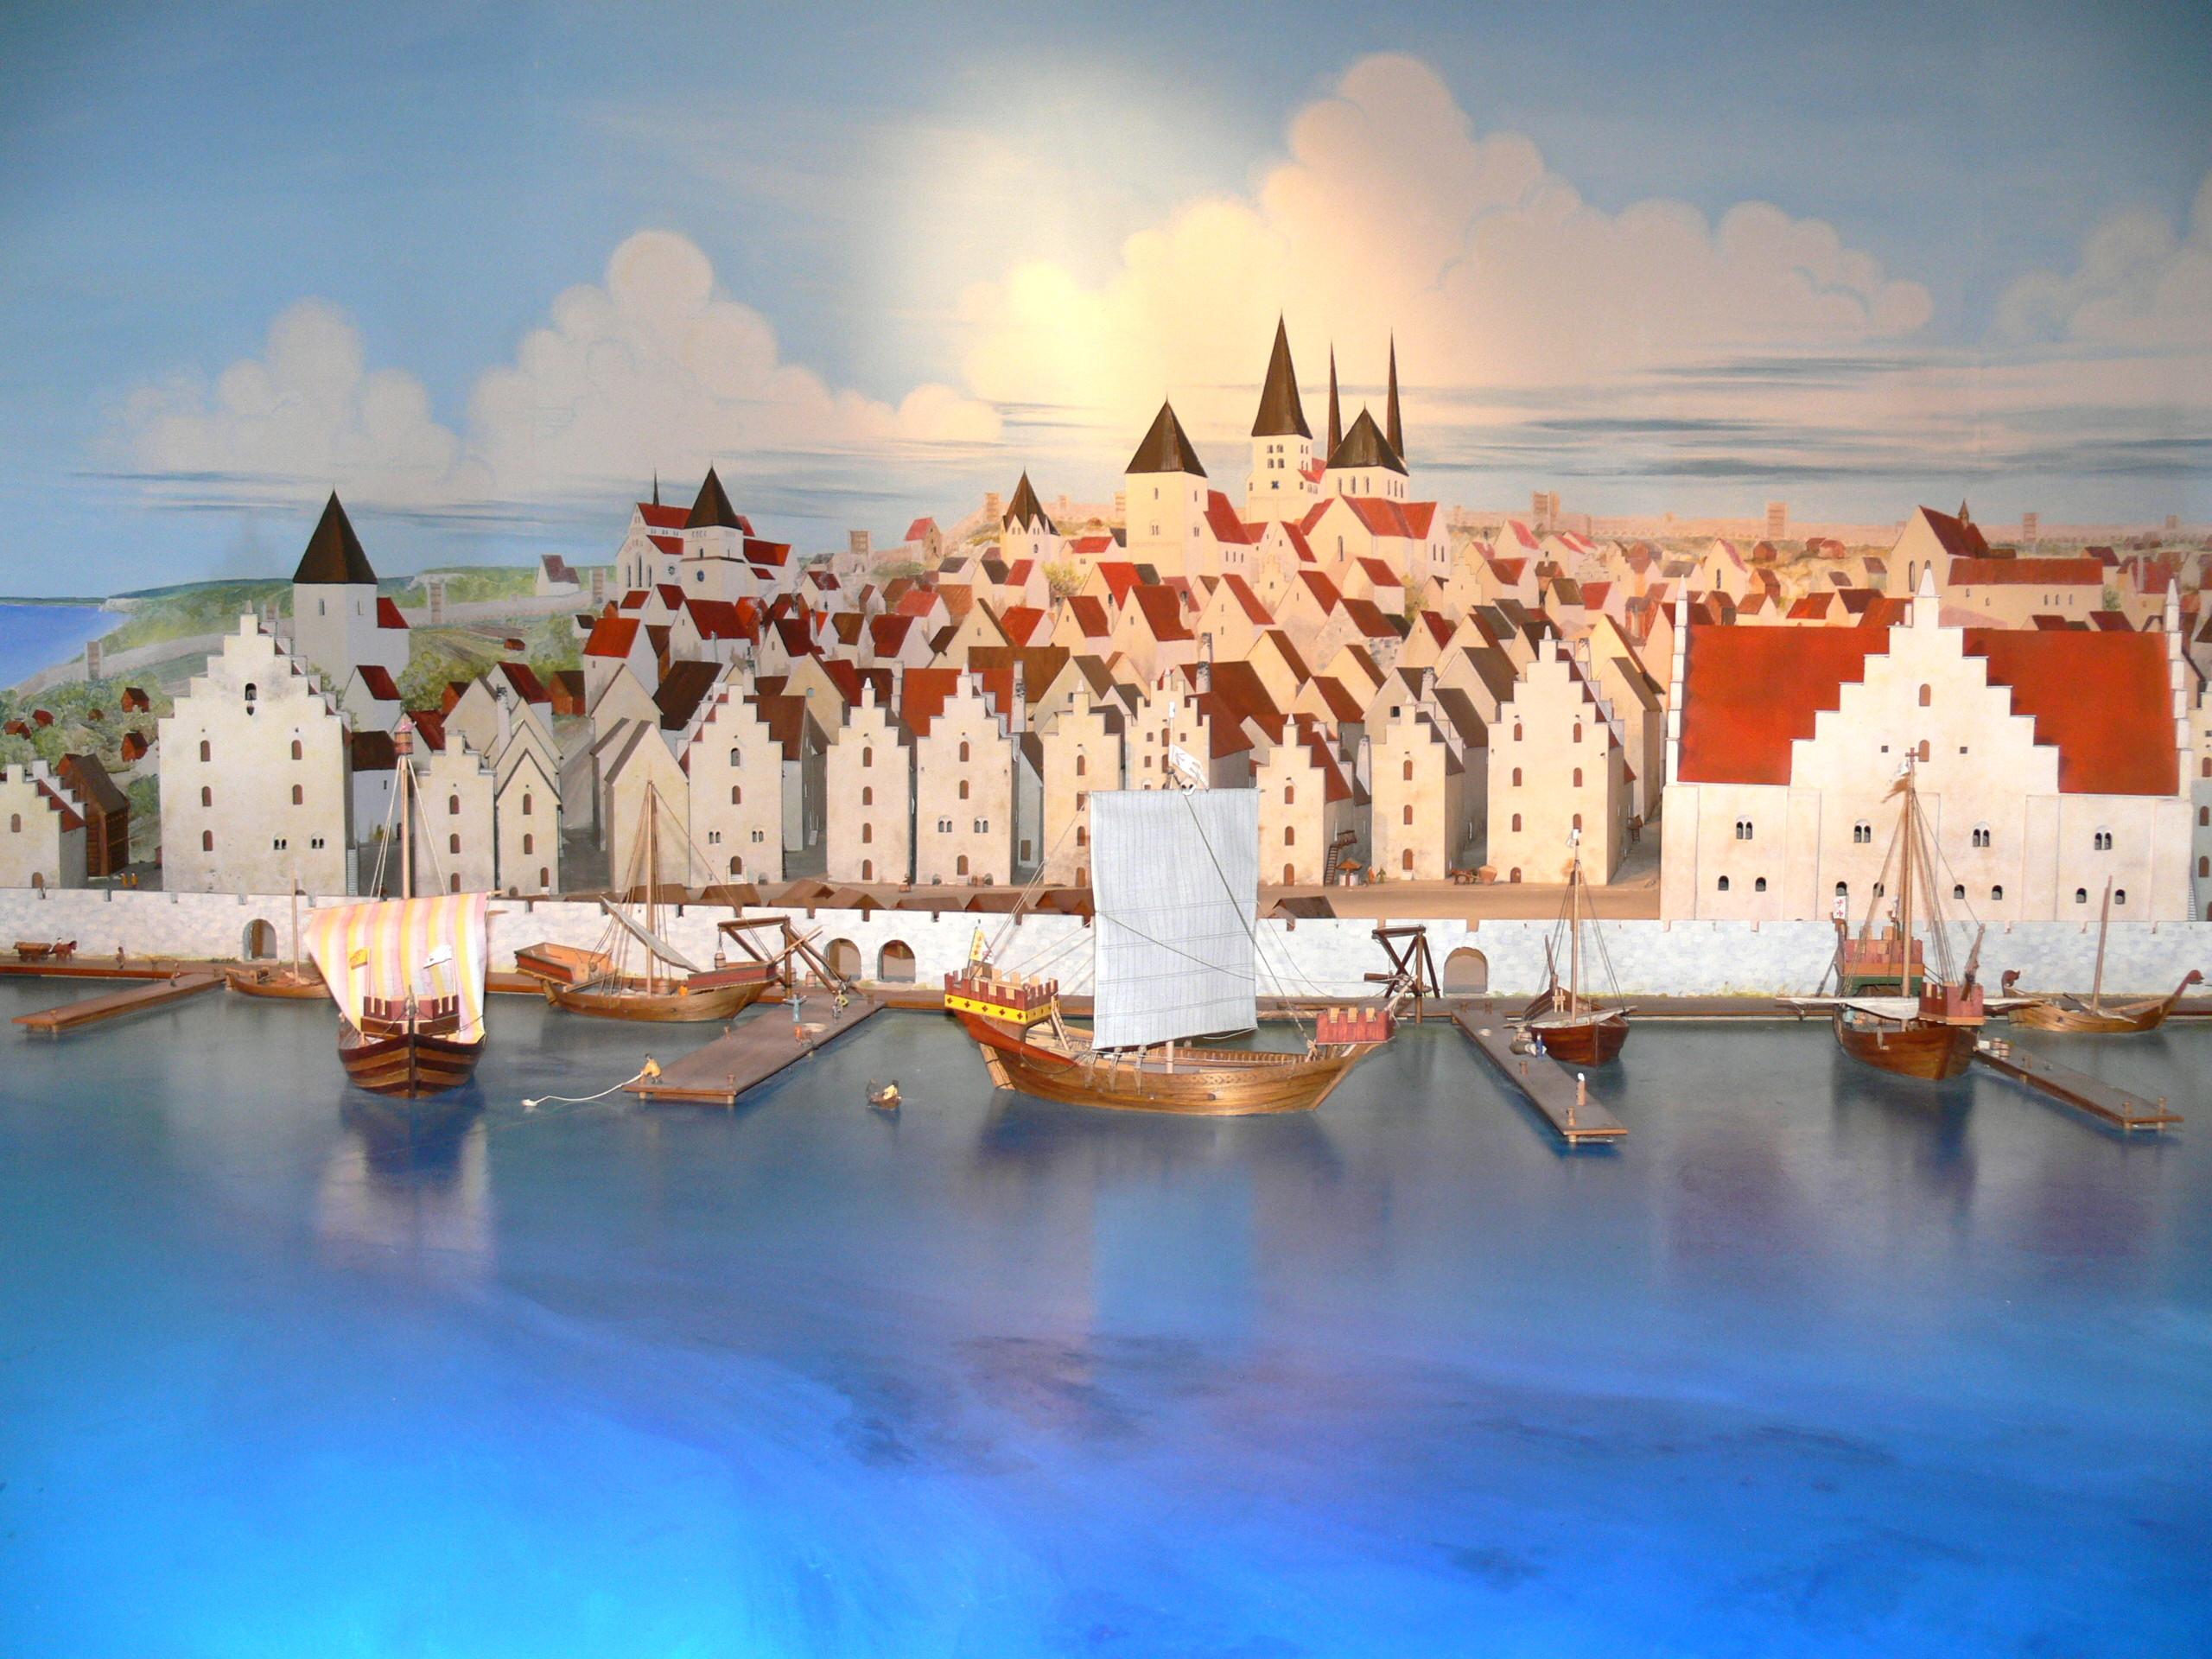 Visby hamn – Wikipedia